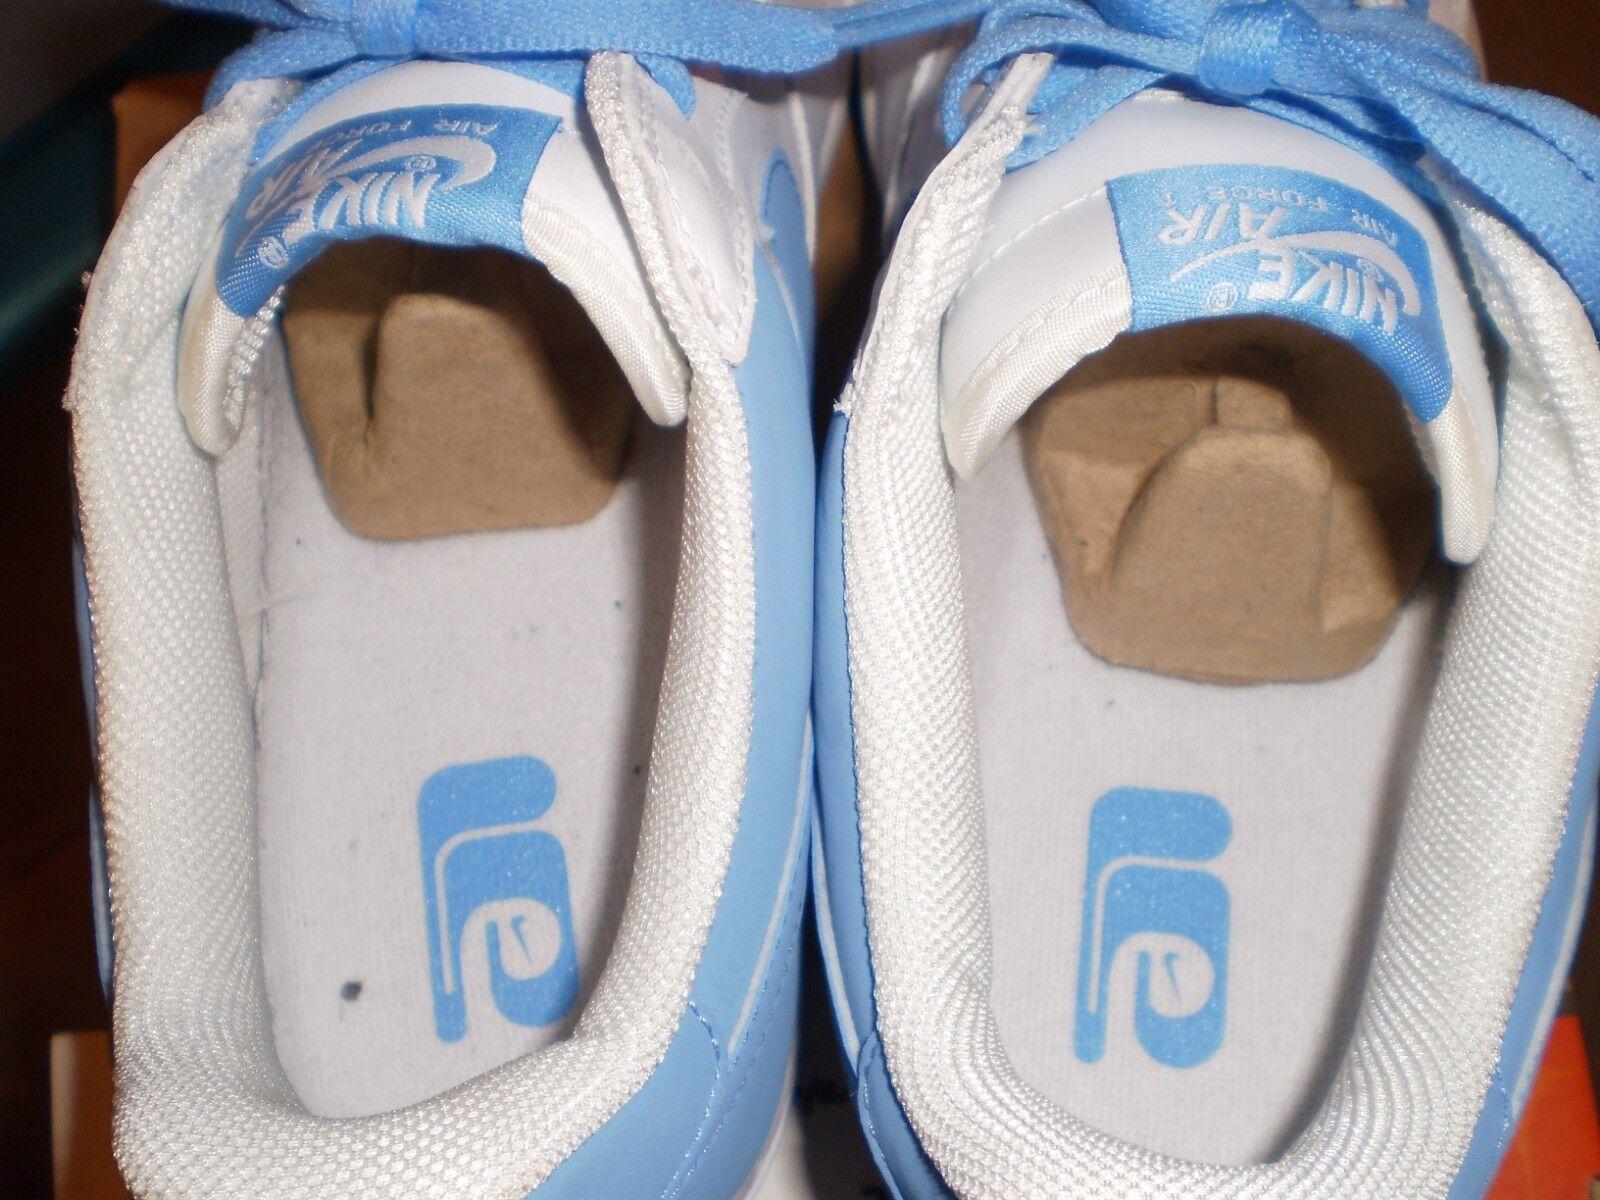 best sneakers 89495 5b1e6 ... VNDS 2006 Nike Air Air Air One Low (White Carolina bluee) sz 11 165.00  ...